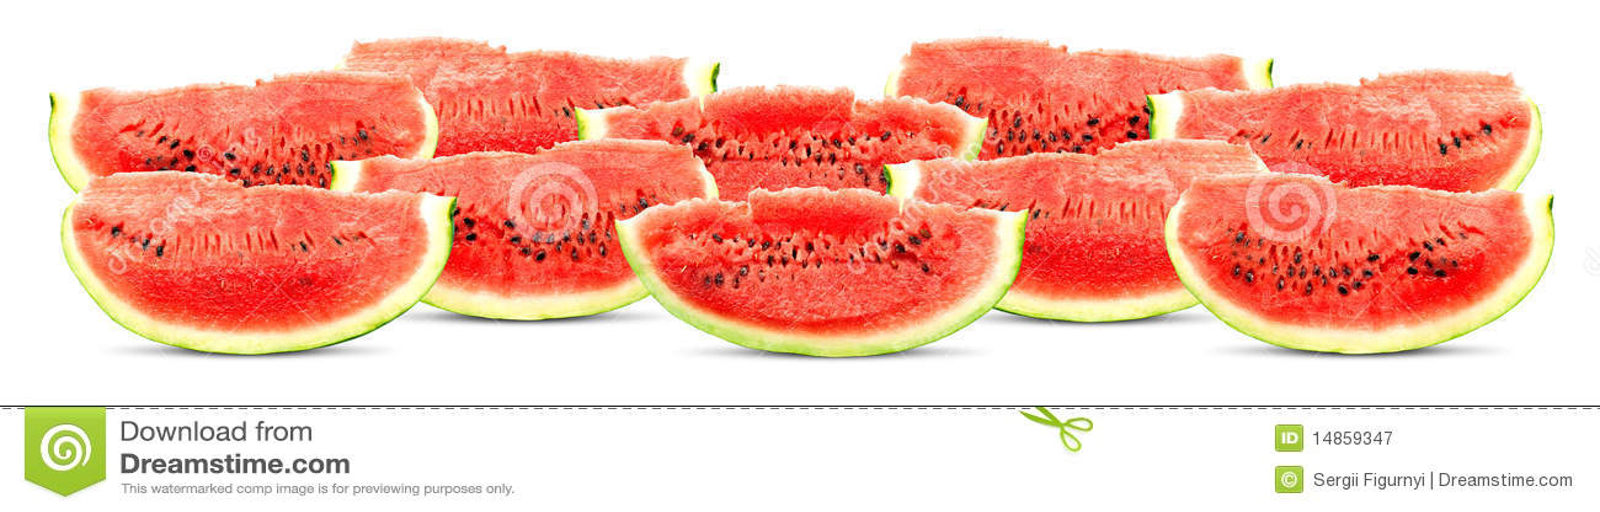 Big red watermelon